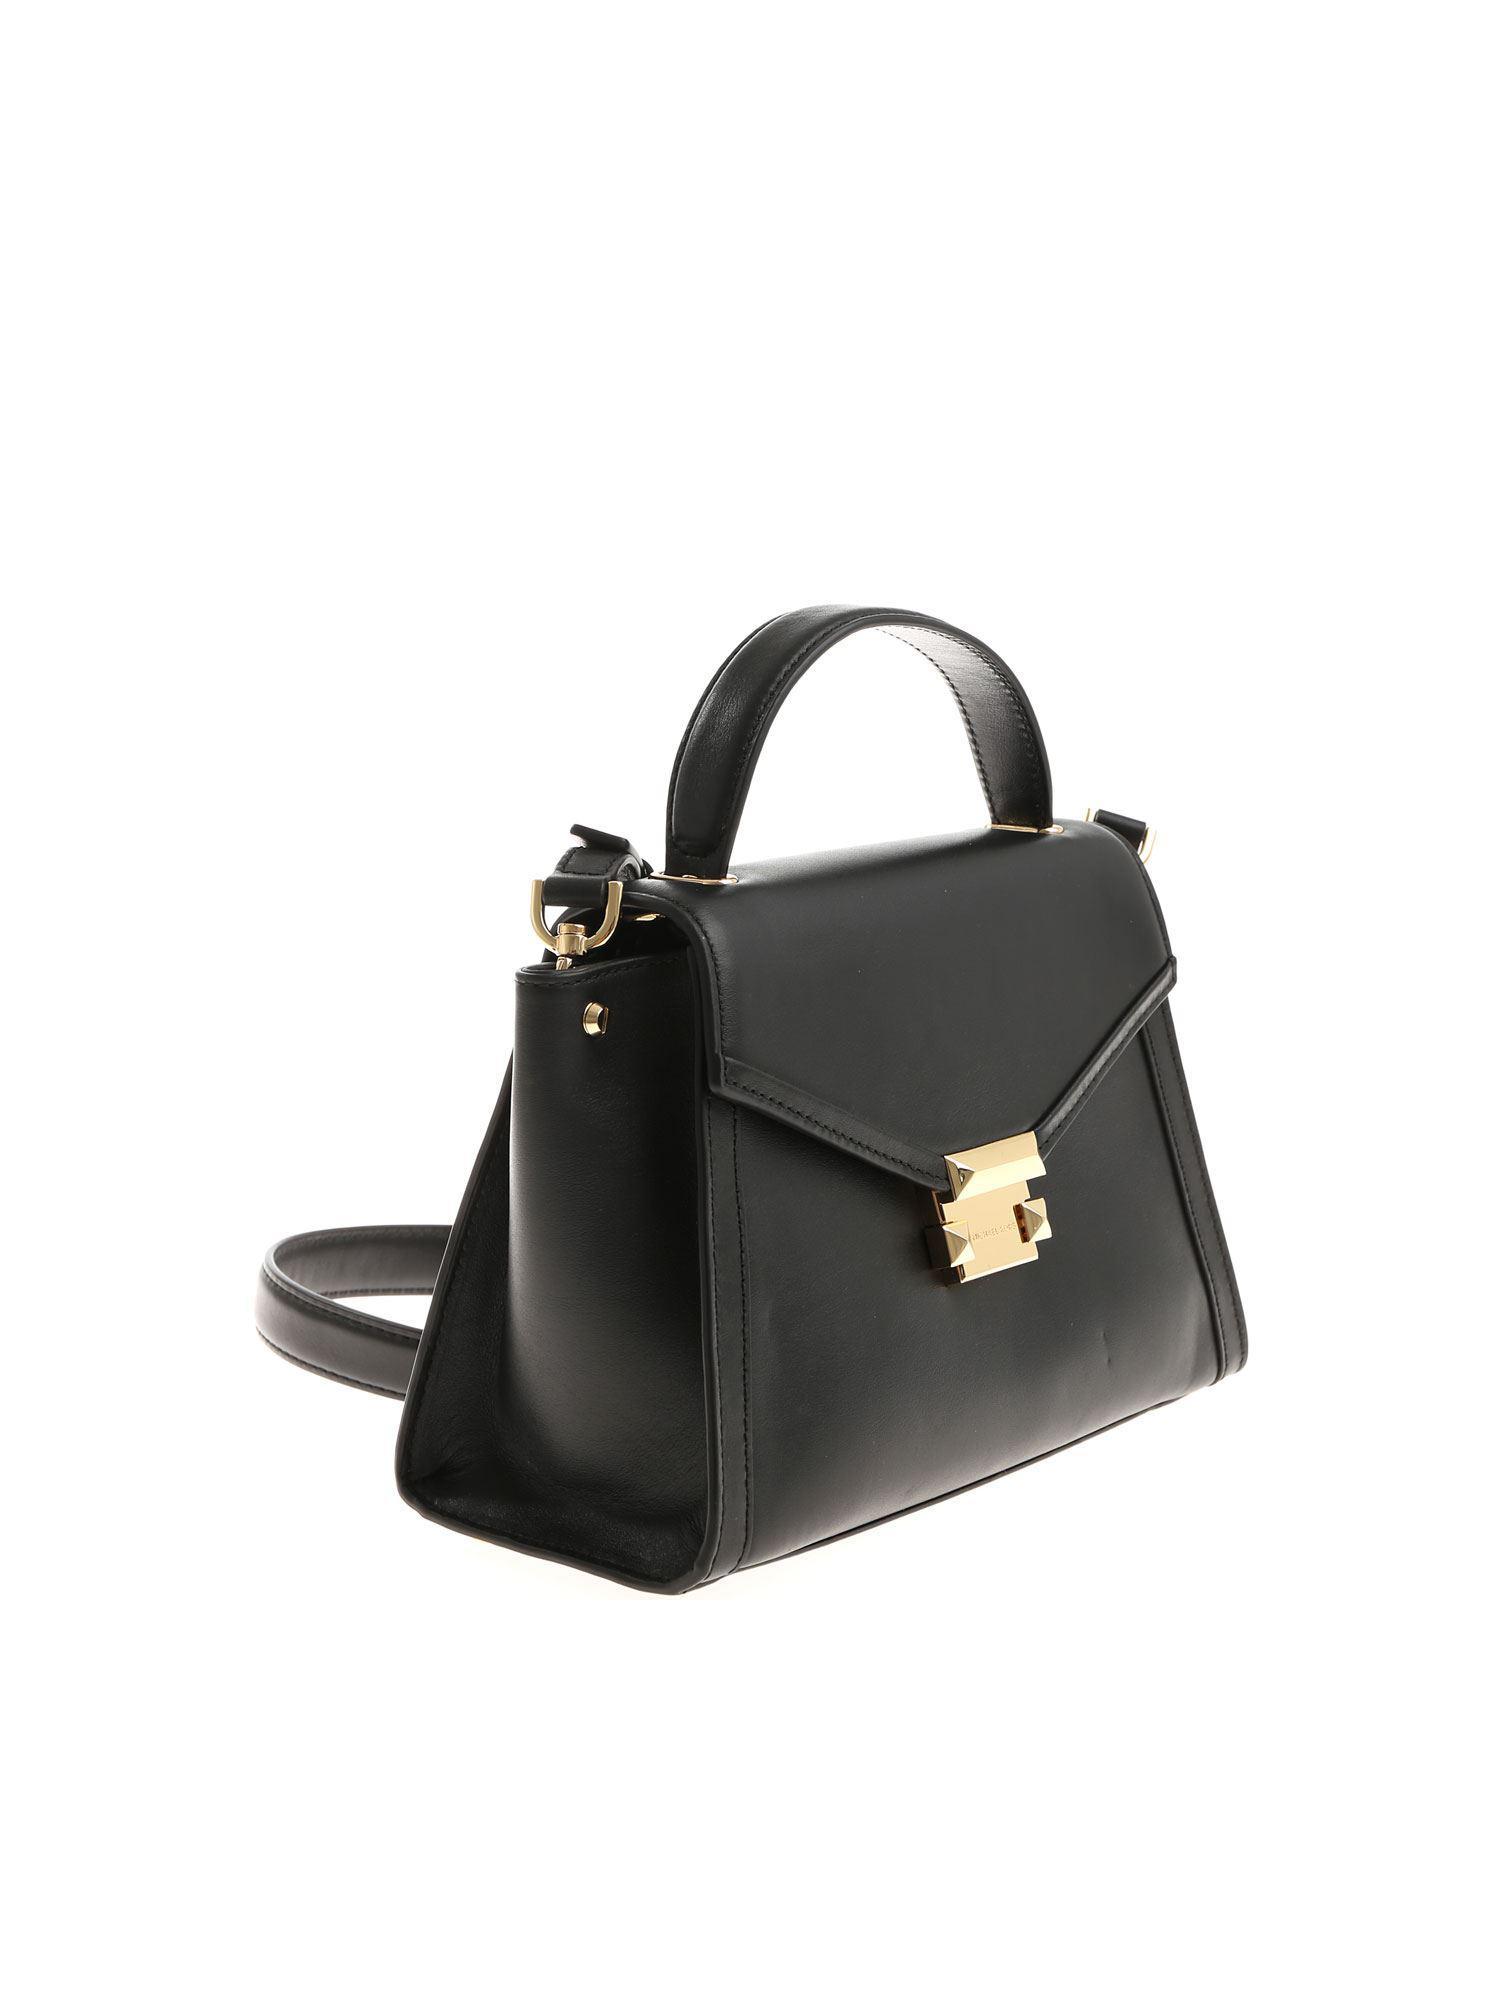 e14a1ff054a5 Michael Kors - Black Whitney Medium Handbag - Lyst. View fullscreen